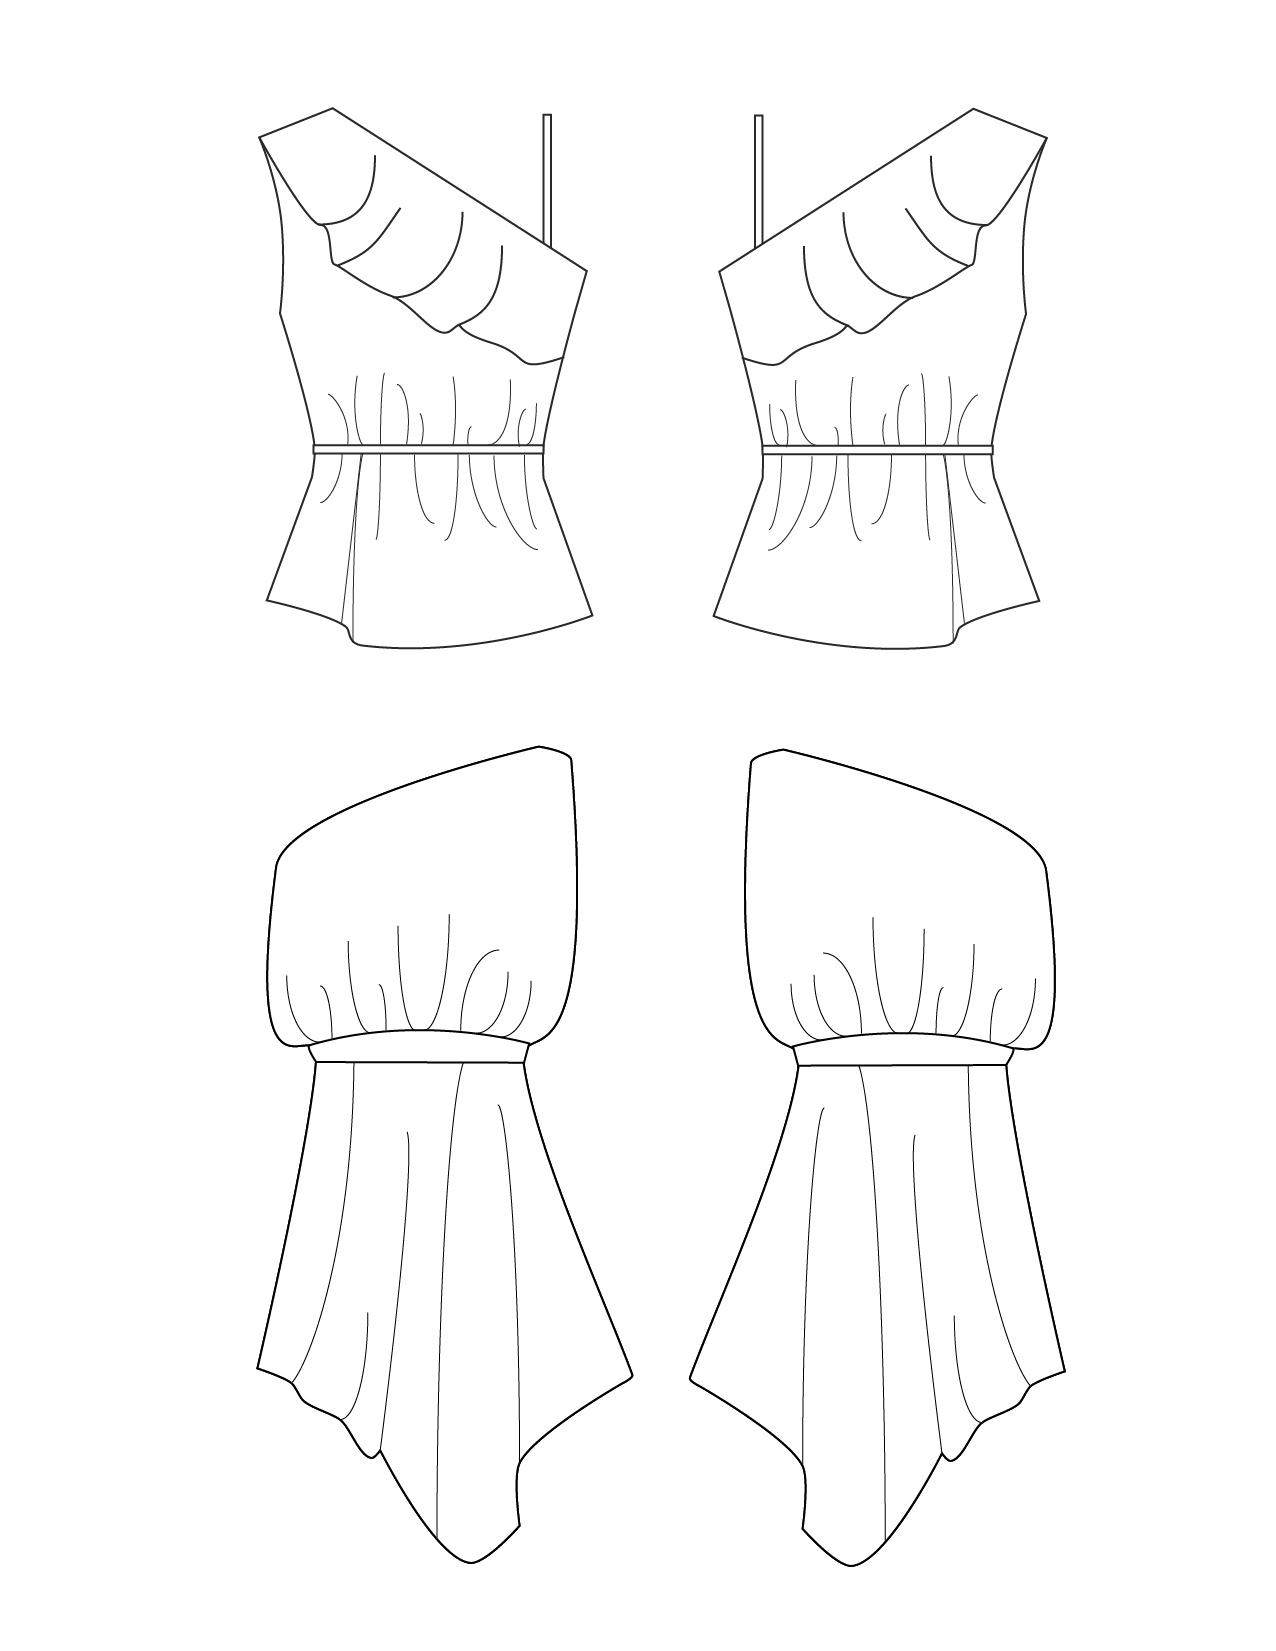 fashion-illustrations-15.jpg